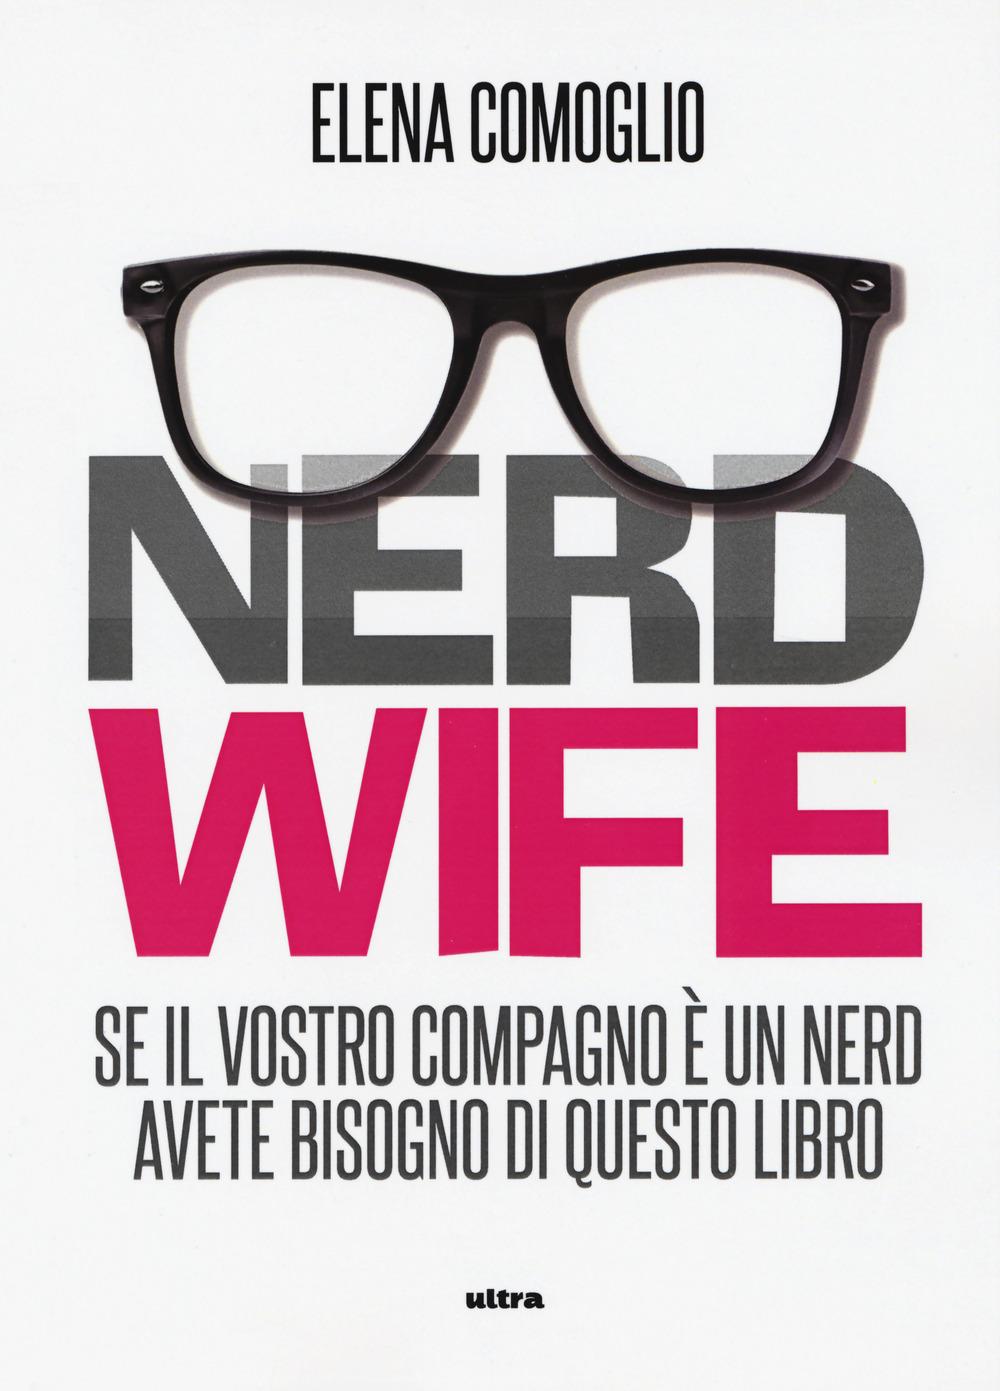 NERD WIFE - Comoglio Elena - 9788867769421